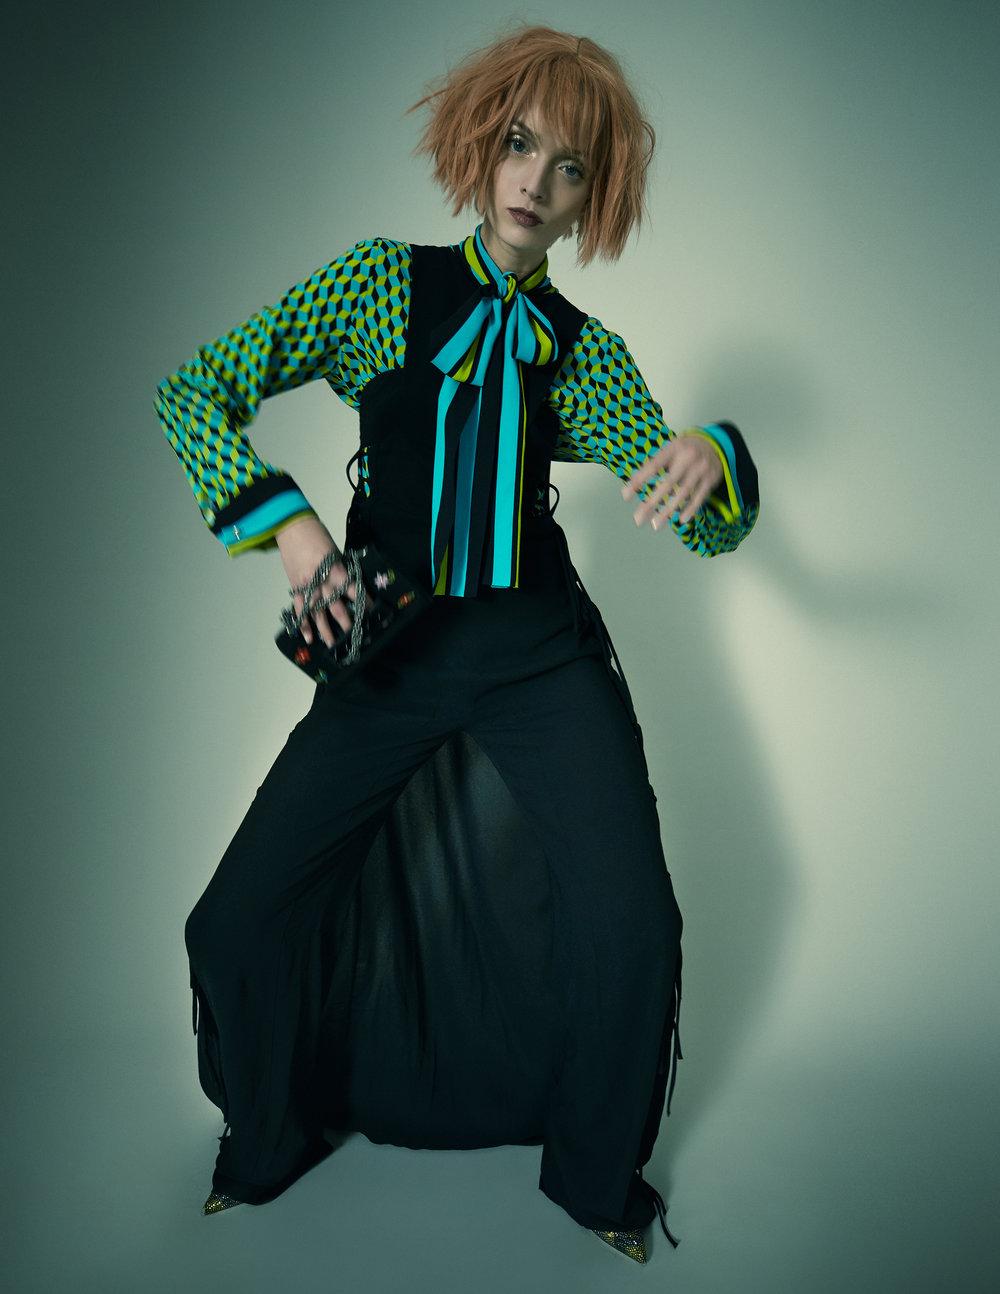 Shirt – Michael Kors Jumpsuit – Antonio Berardi Bag – Valentino Shoes – Valentino